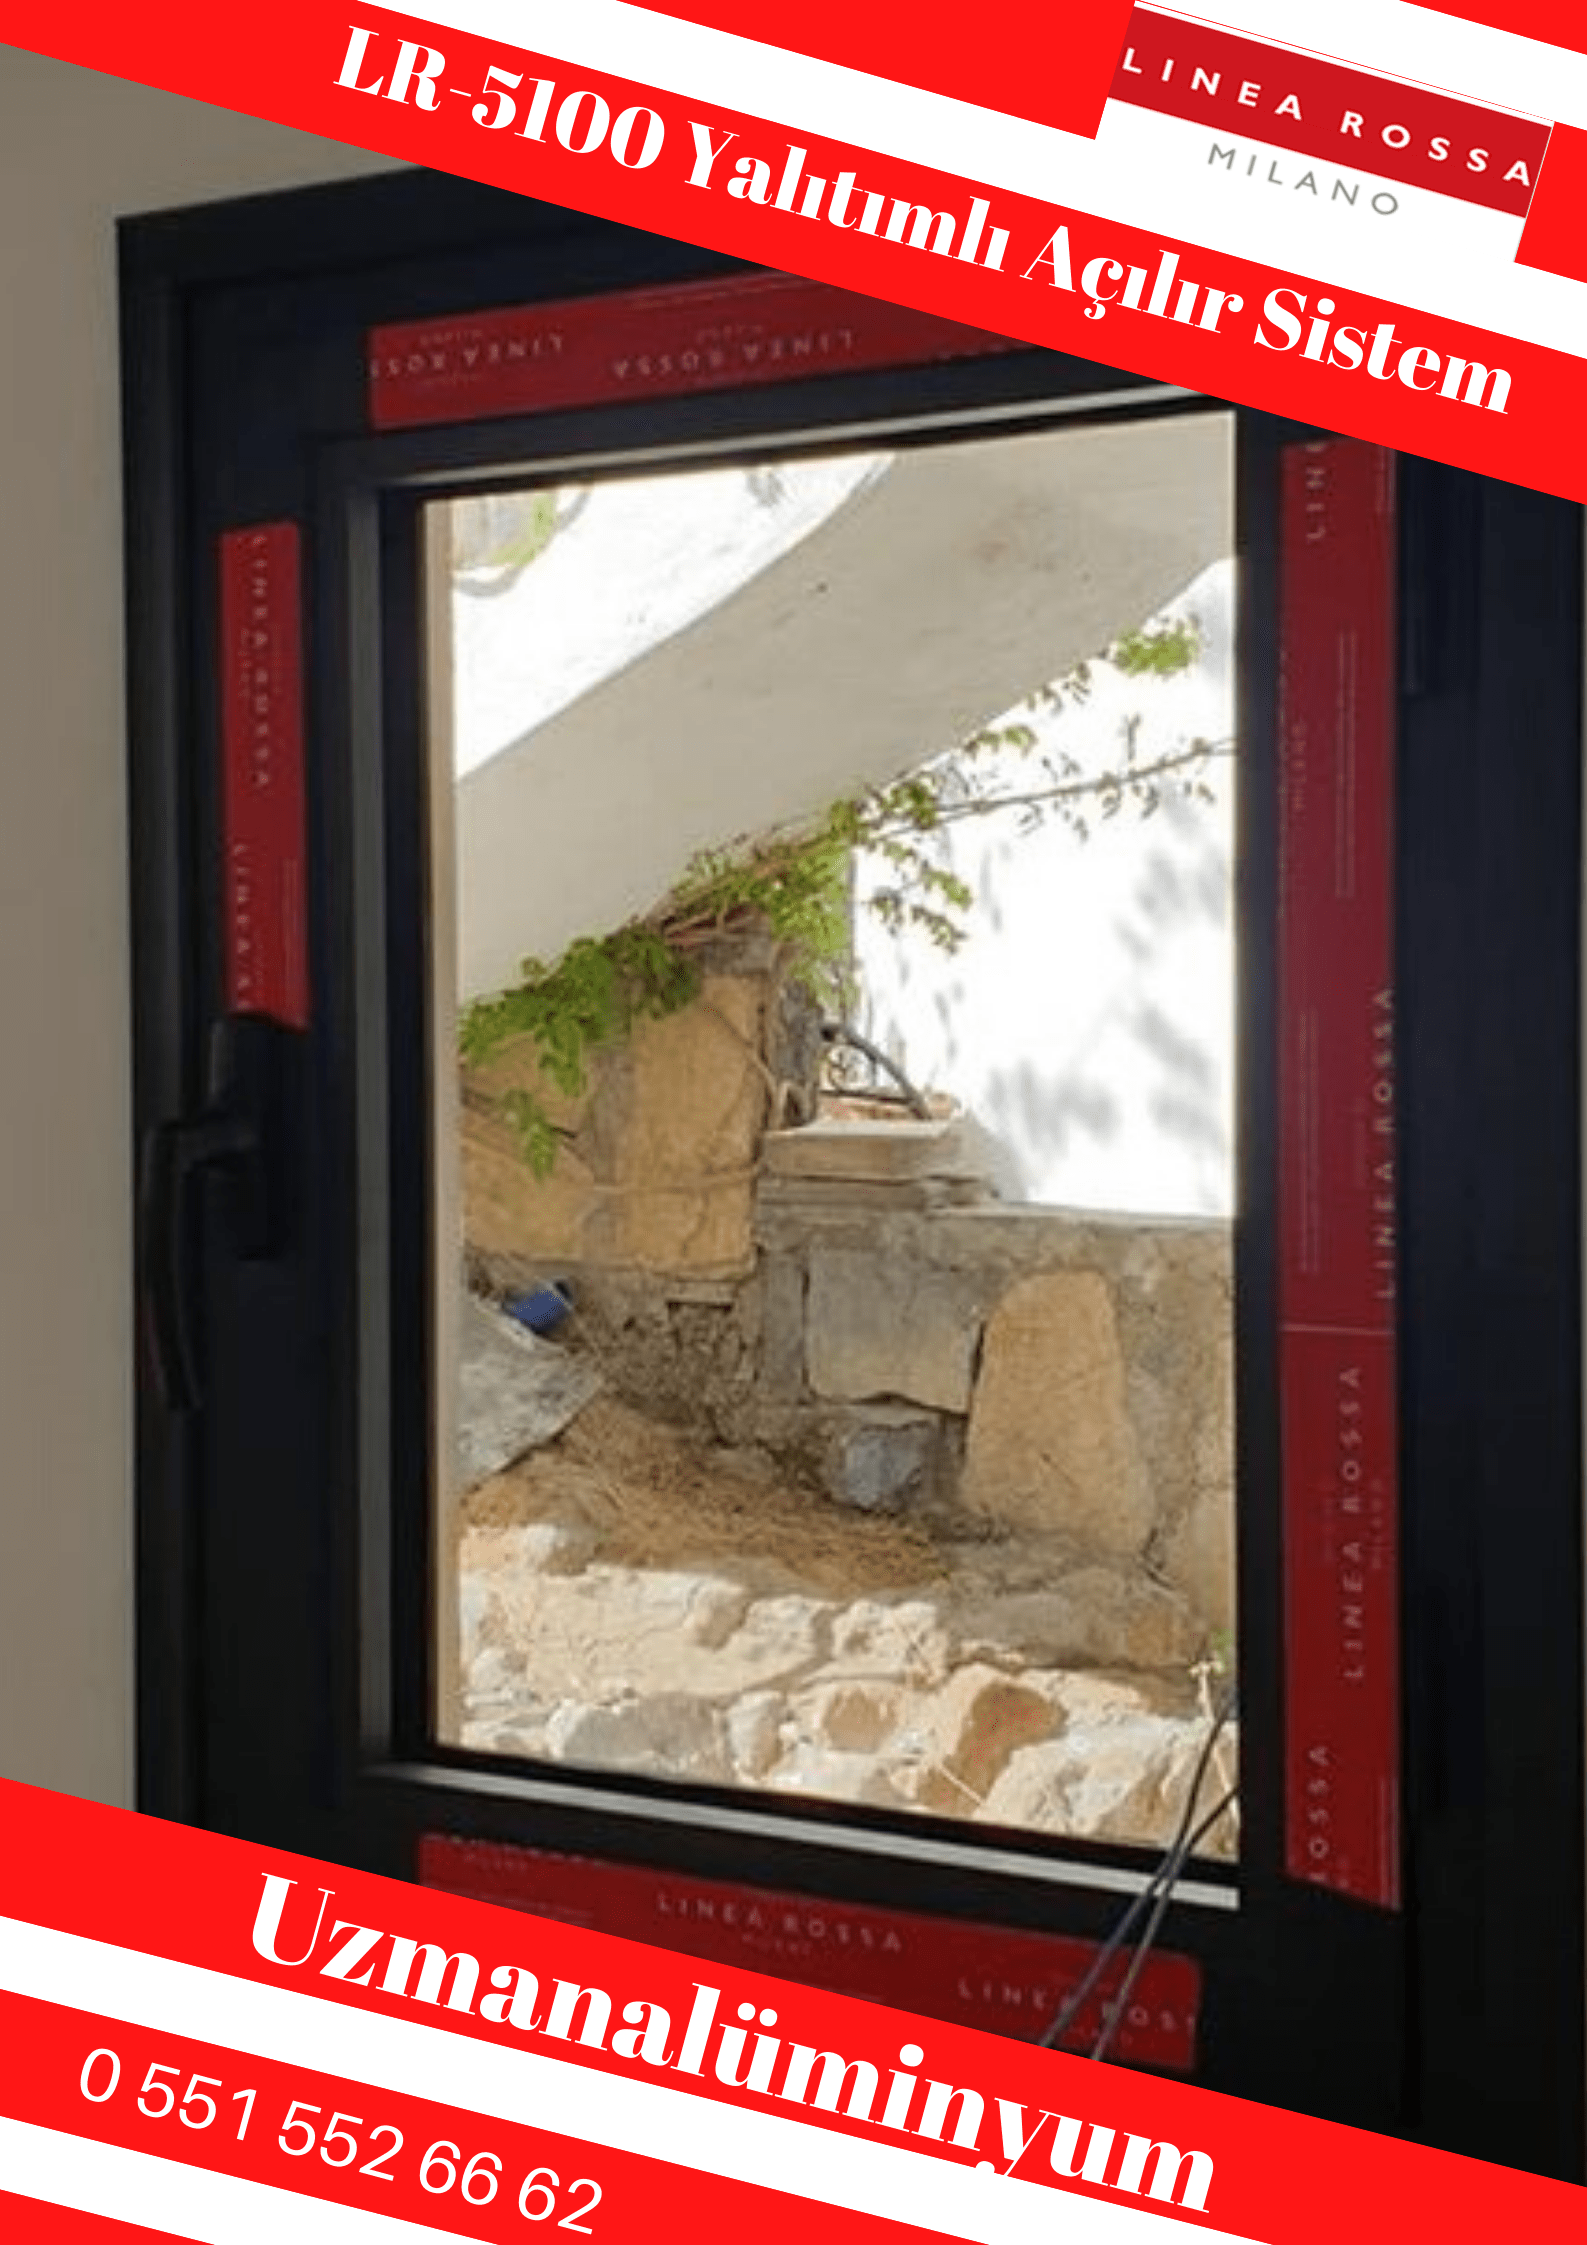 Linea Rossa LR-5100 kapı pencere İzmir